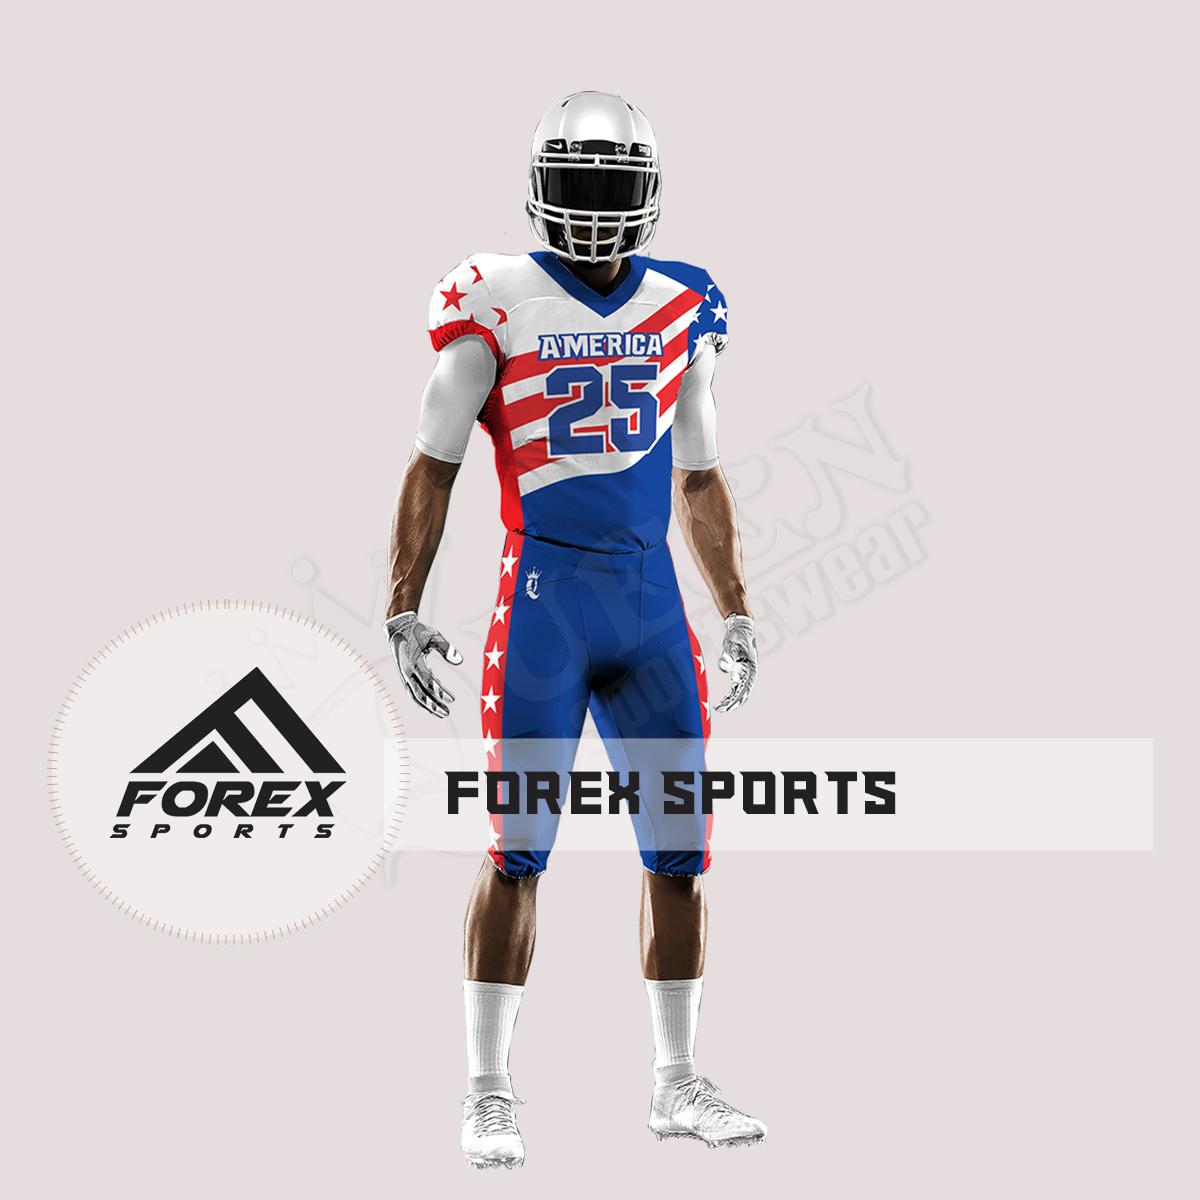 inexpensive football jerseys